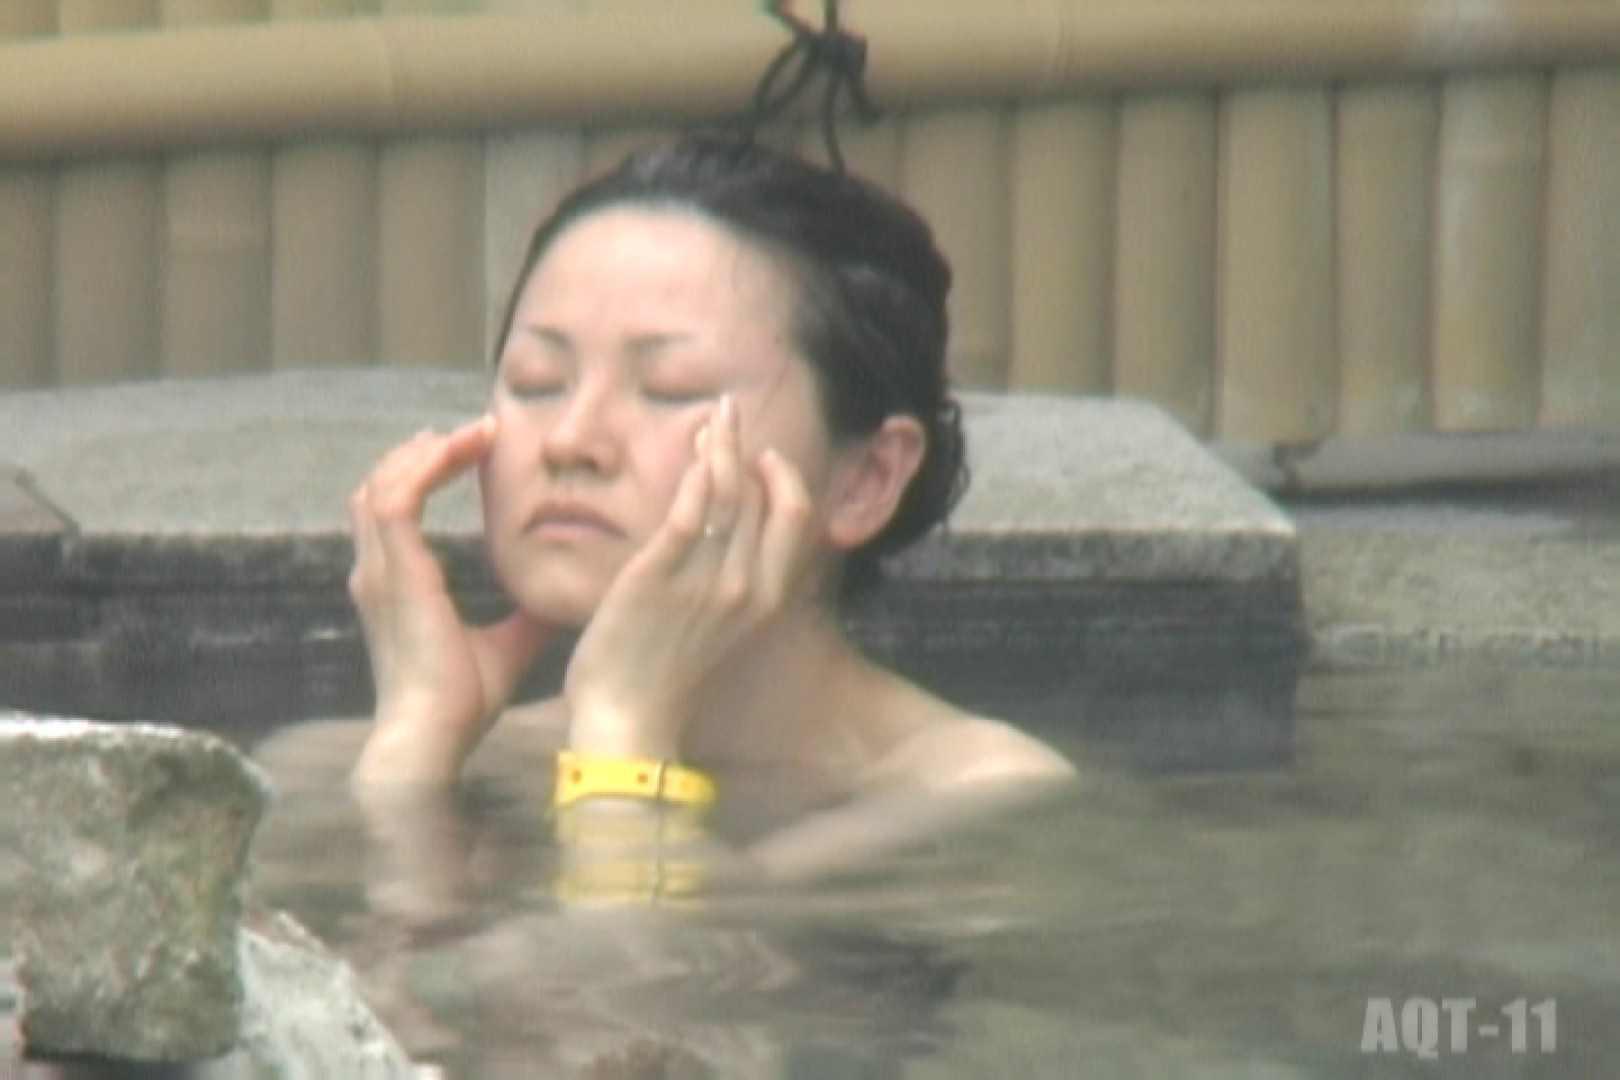 Aquaな露天風呂Vol.802 女体盗撮 盗み撮りSEX無修正画像 85連発 53